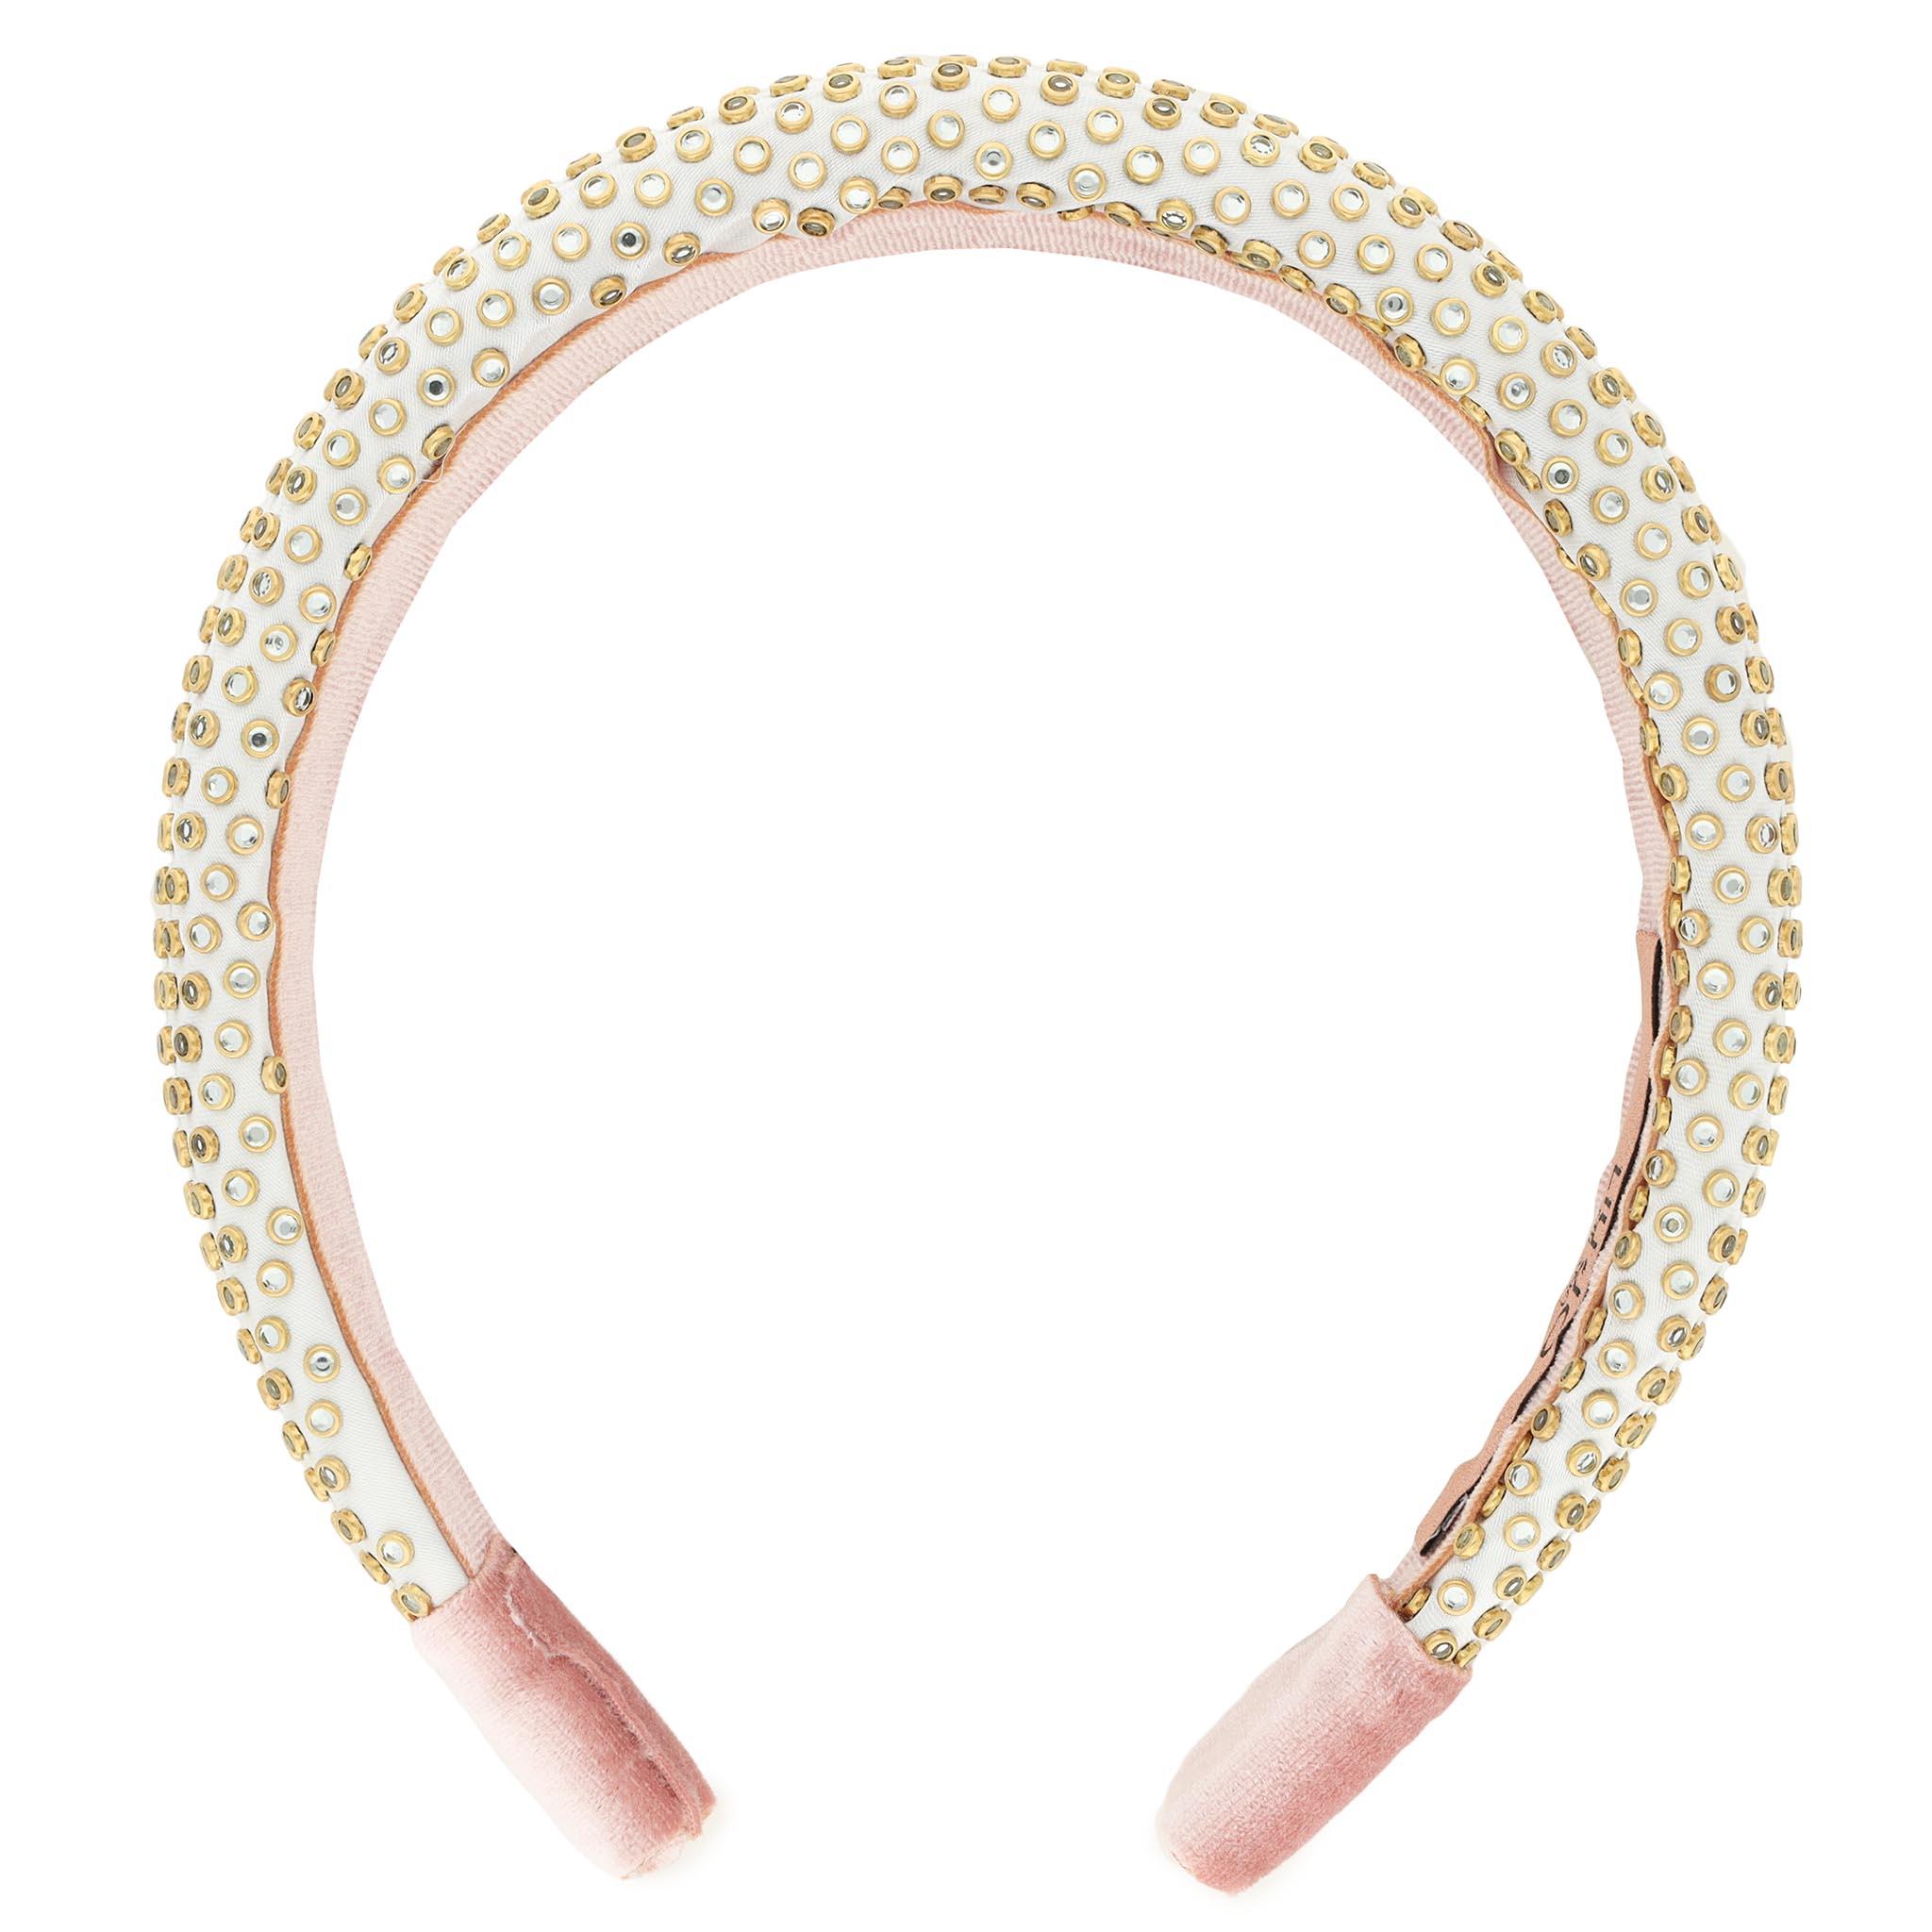 Image of 2er-Set Haarbänder LIU JO - Pack X2 Cerechietti 2A1046 T0300 Silver Pink/Stars T9450